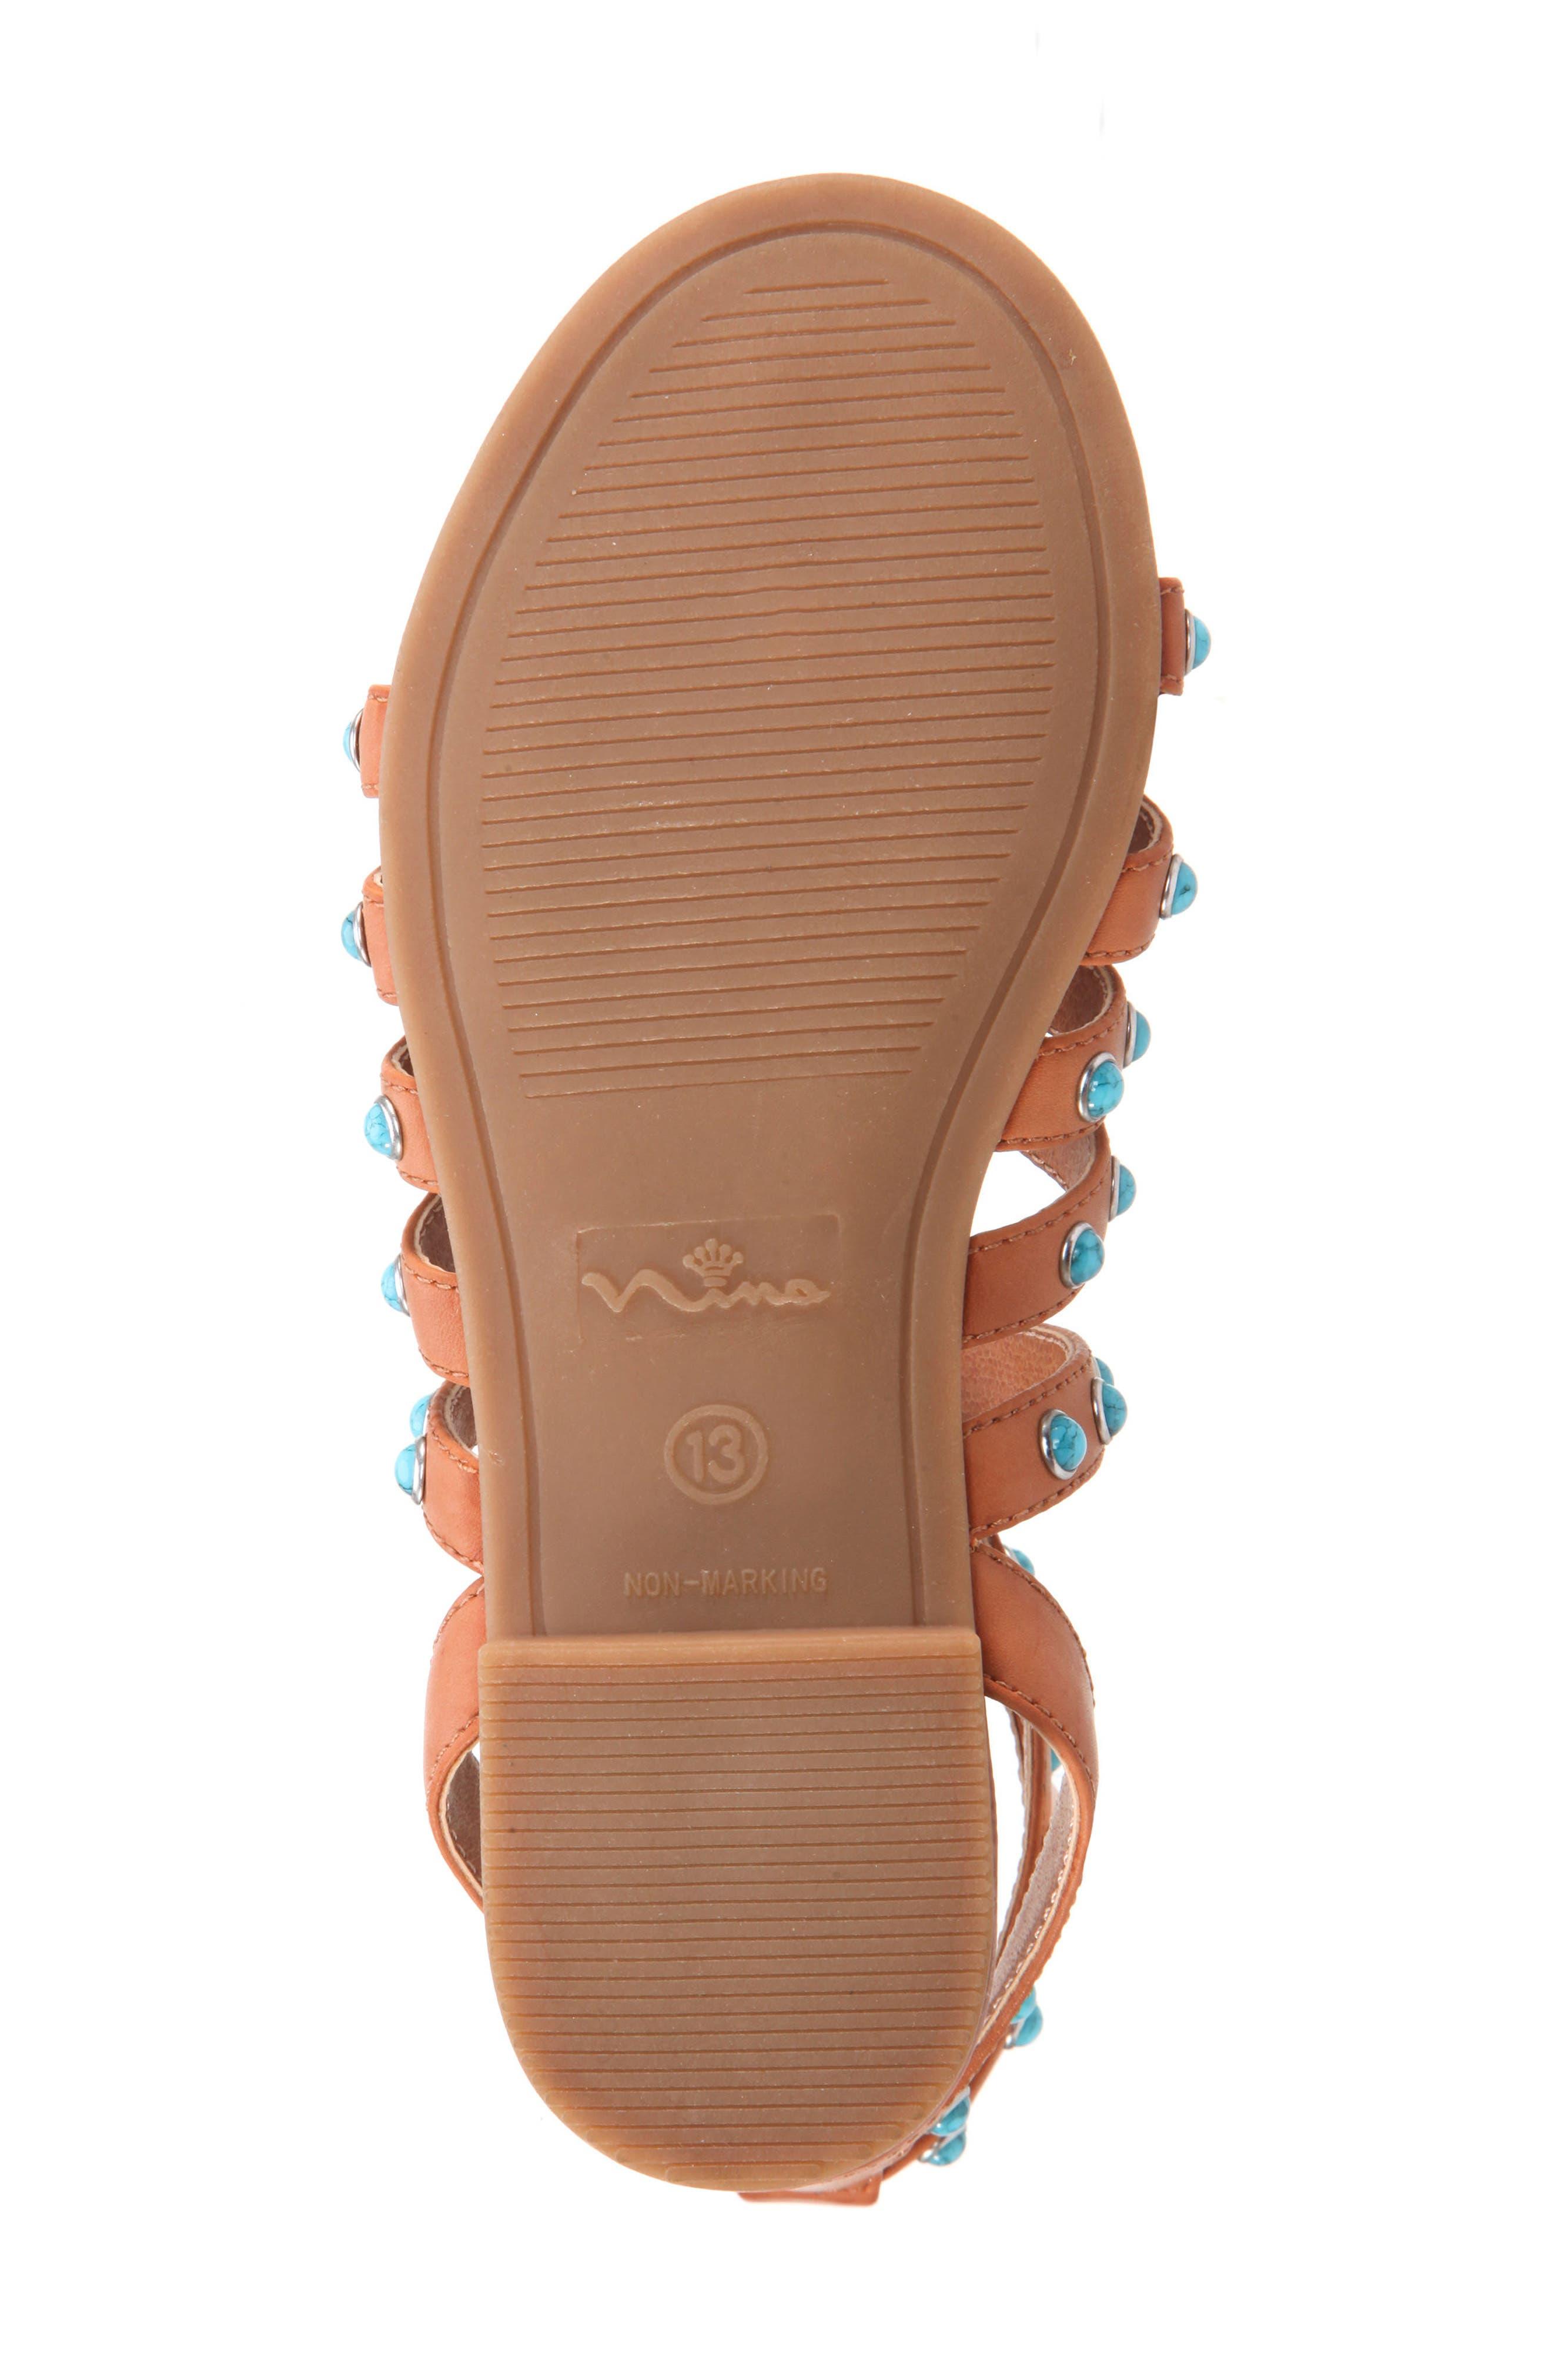 Tammara Studded Gladiator Sandal,                             Alternate thumbnail 6, color,                             Tan Burnished